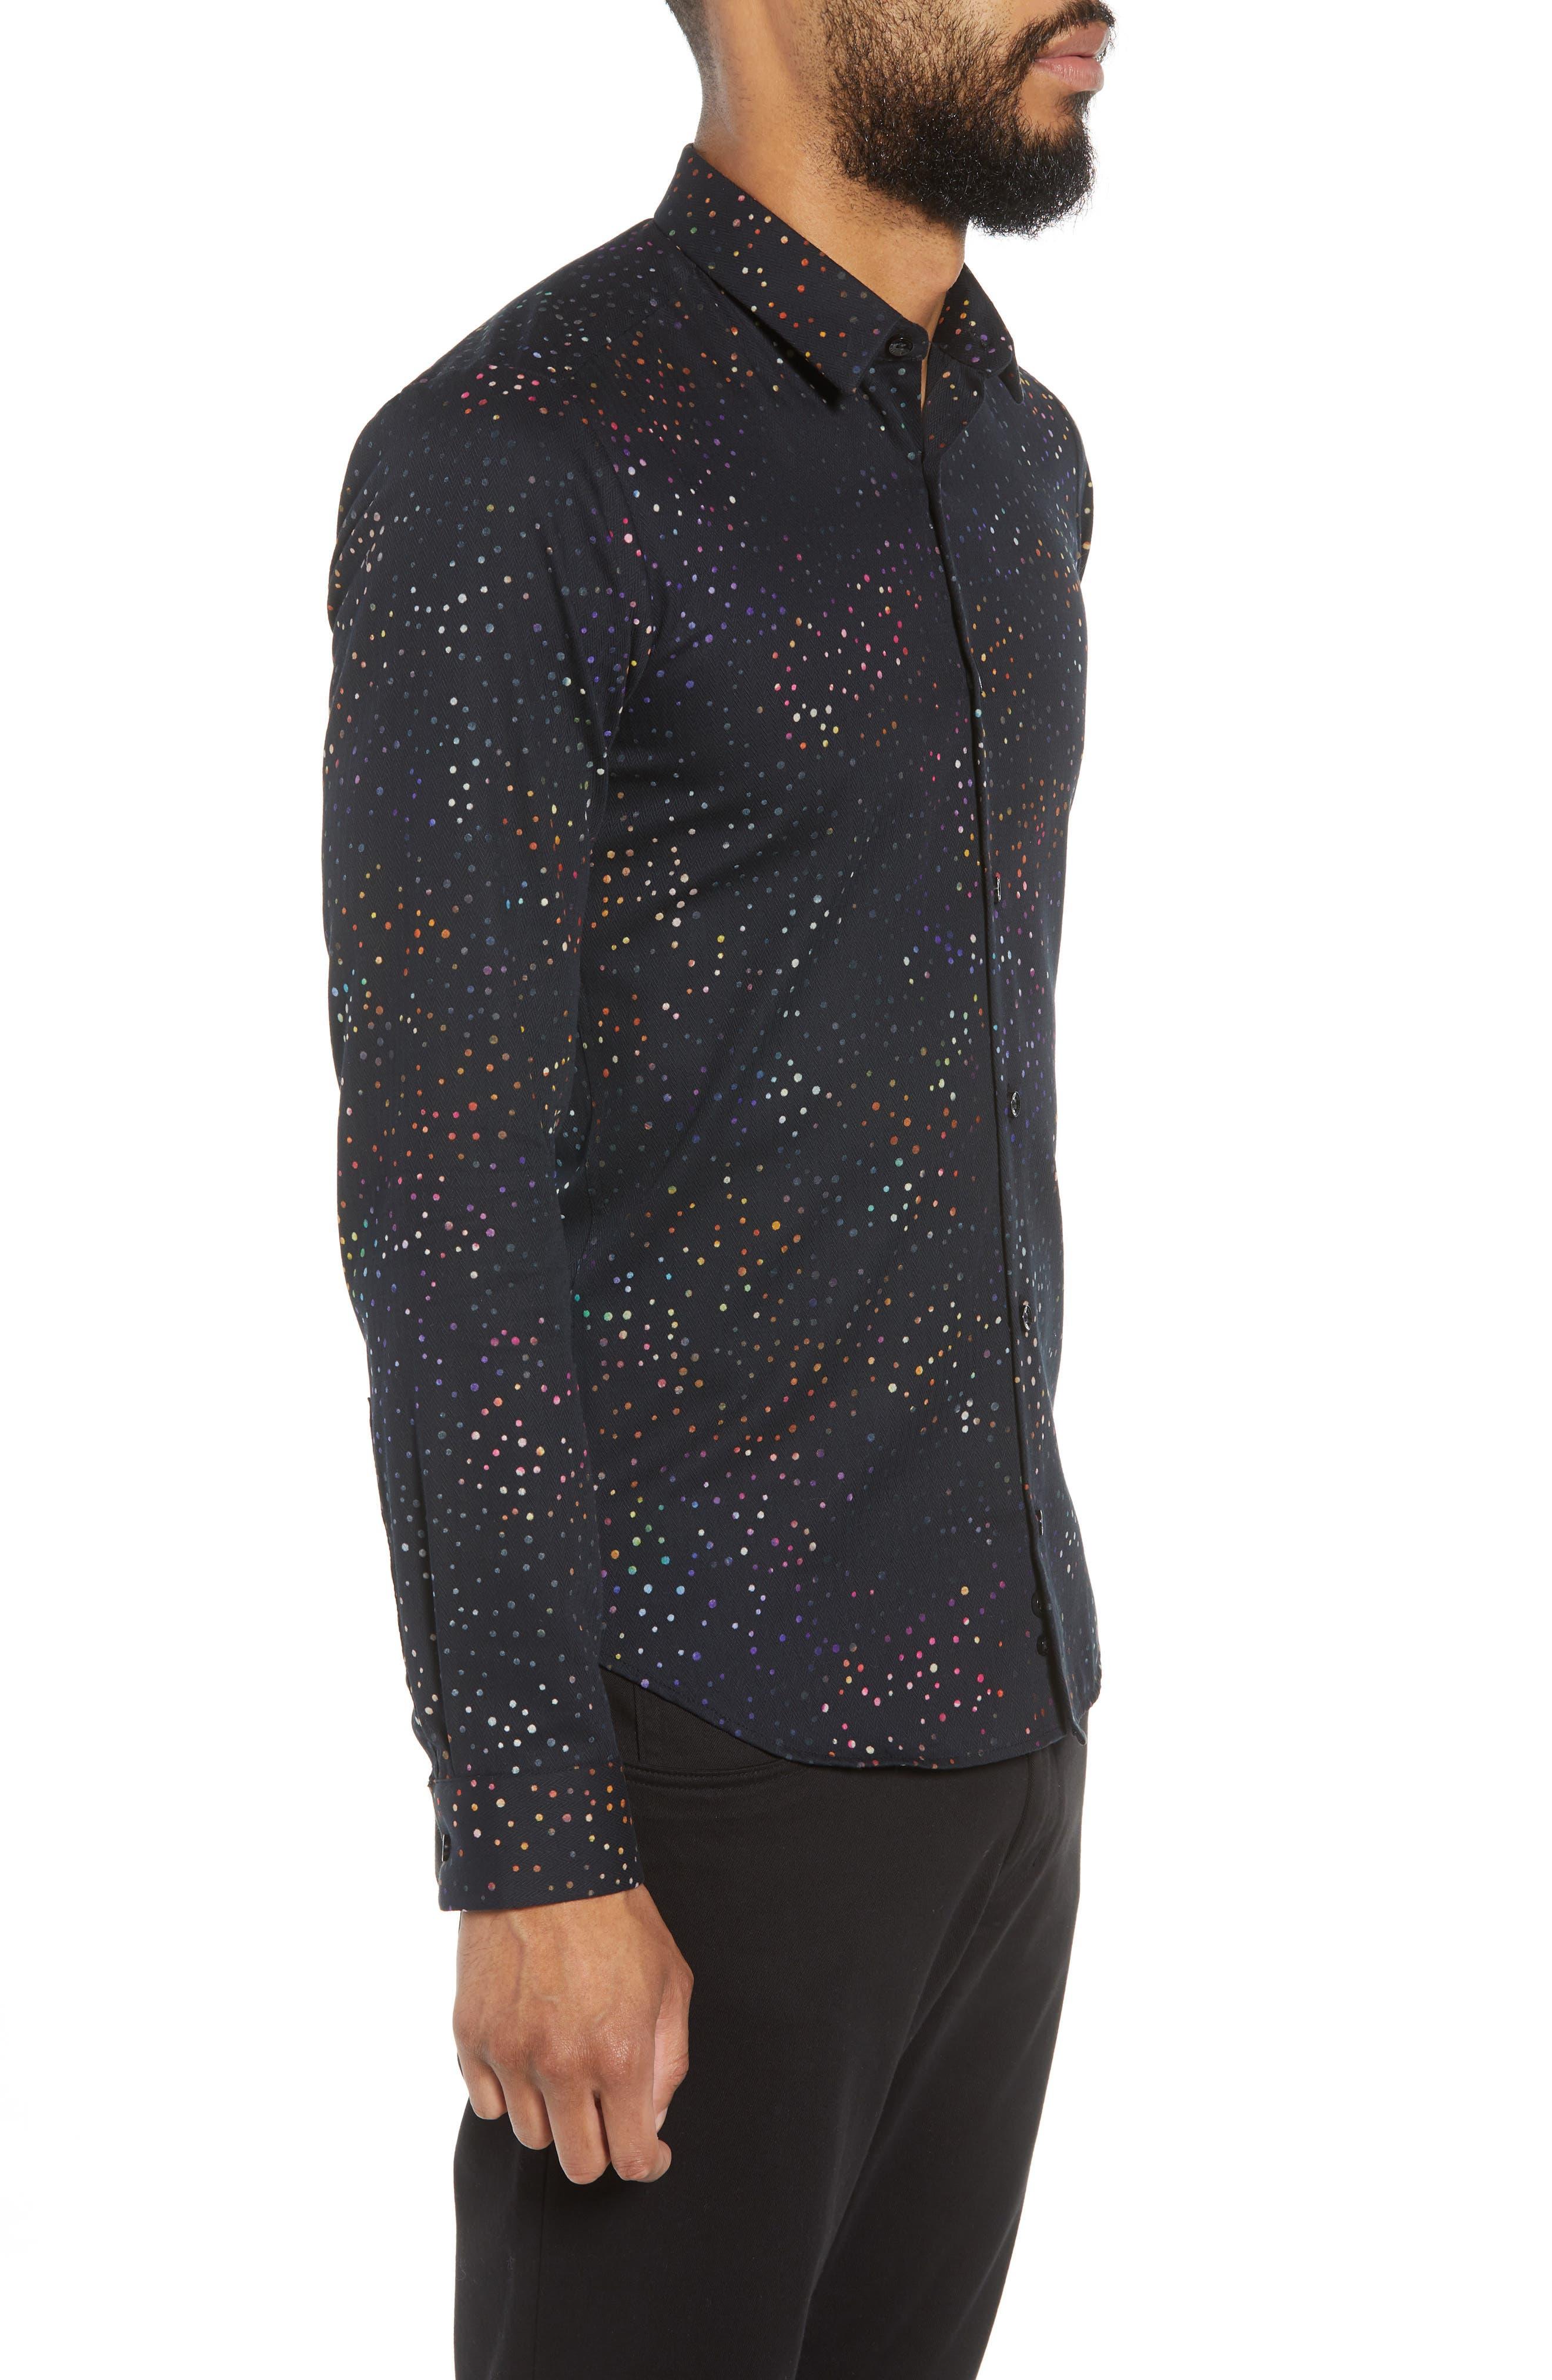 JARED LANG,                             Dot Herringbone Sport Shirt,                             Alternate thumbnail 3, color,                             BLACK MULTI COLORED DOTS